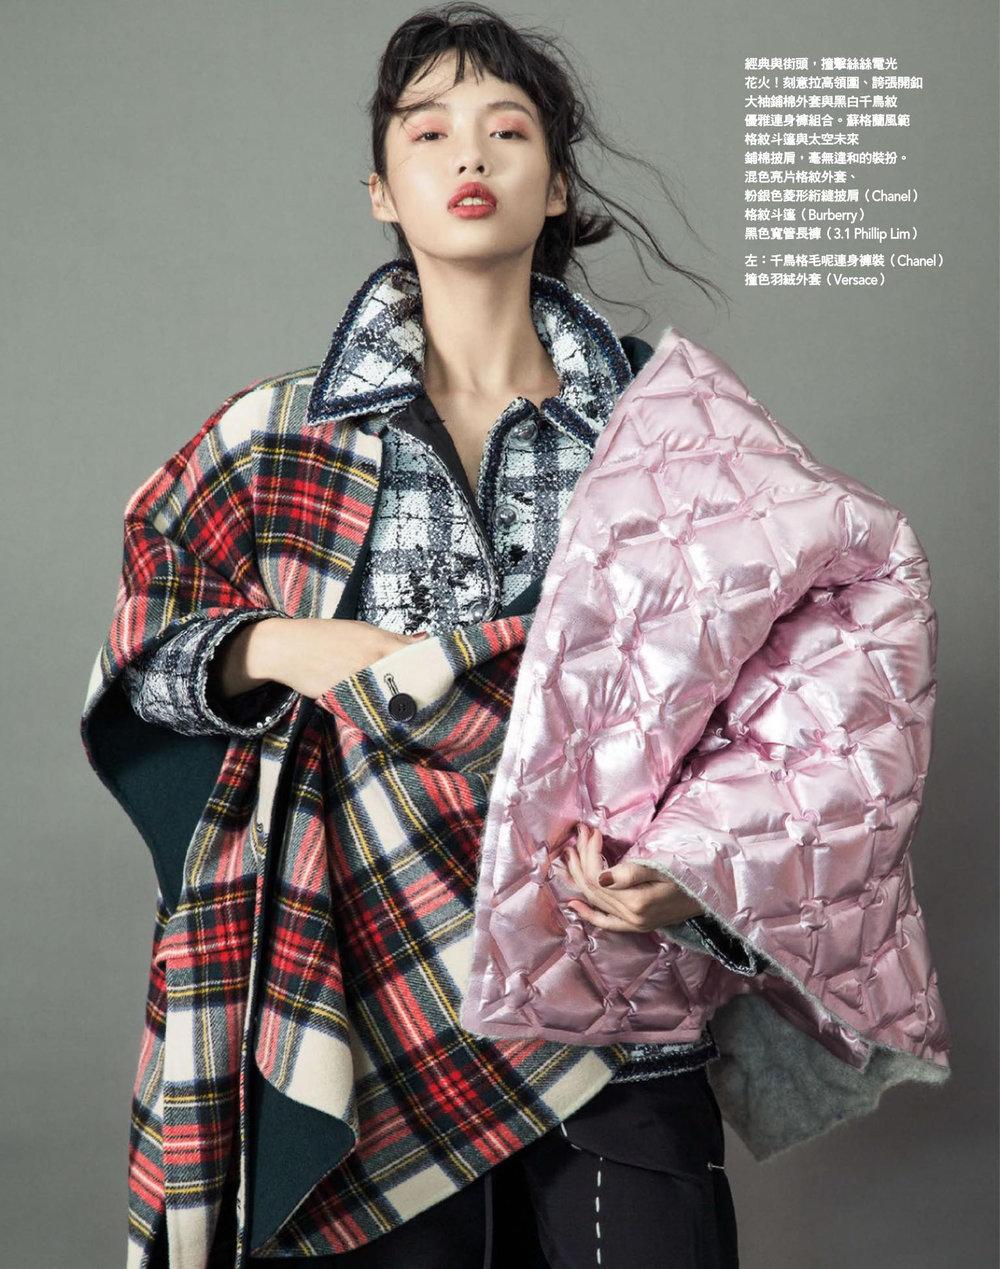 Photo / lee shou -chi Hair / Joshua Liao Model / Daisy Stylist / yu kwen